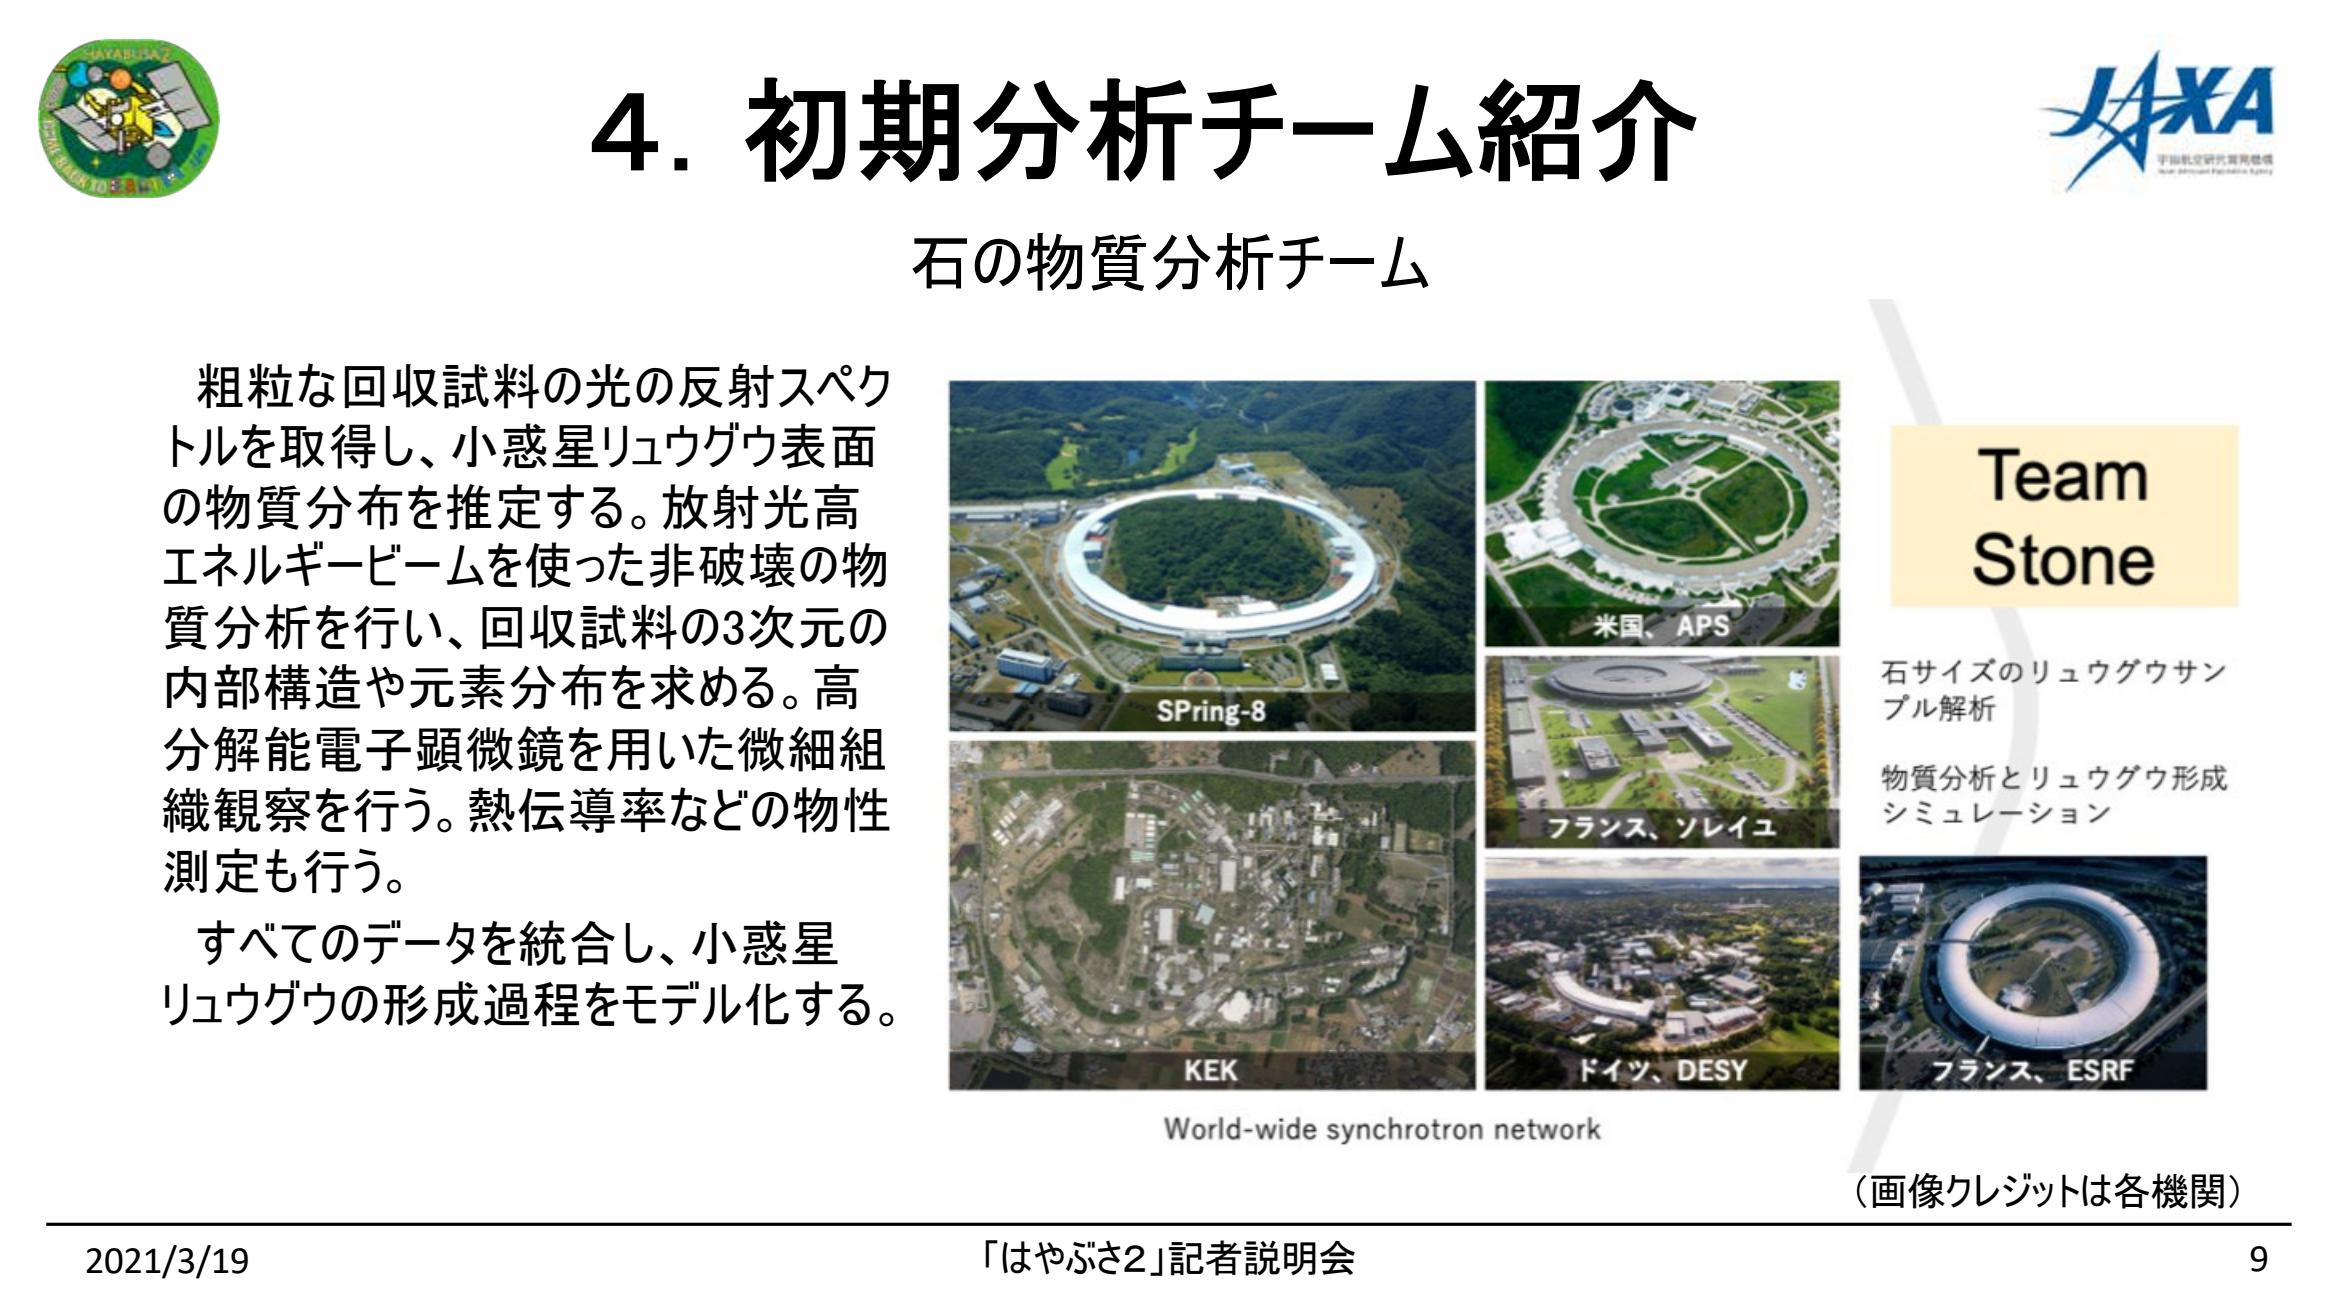 f:id:Imamura:20210319144447p:image